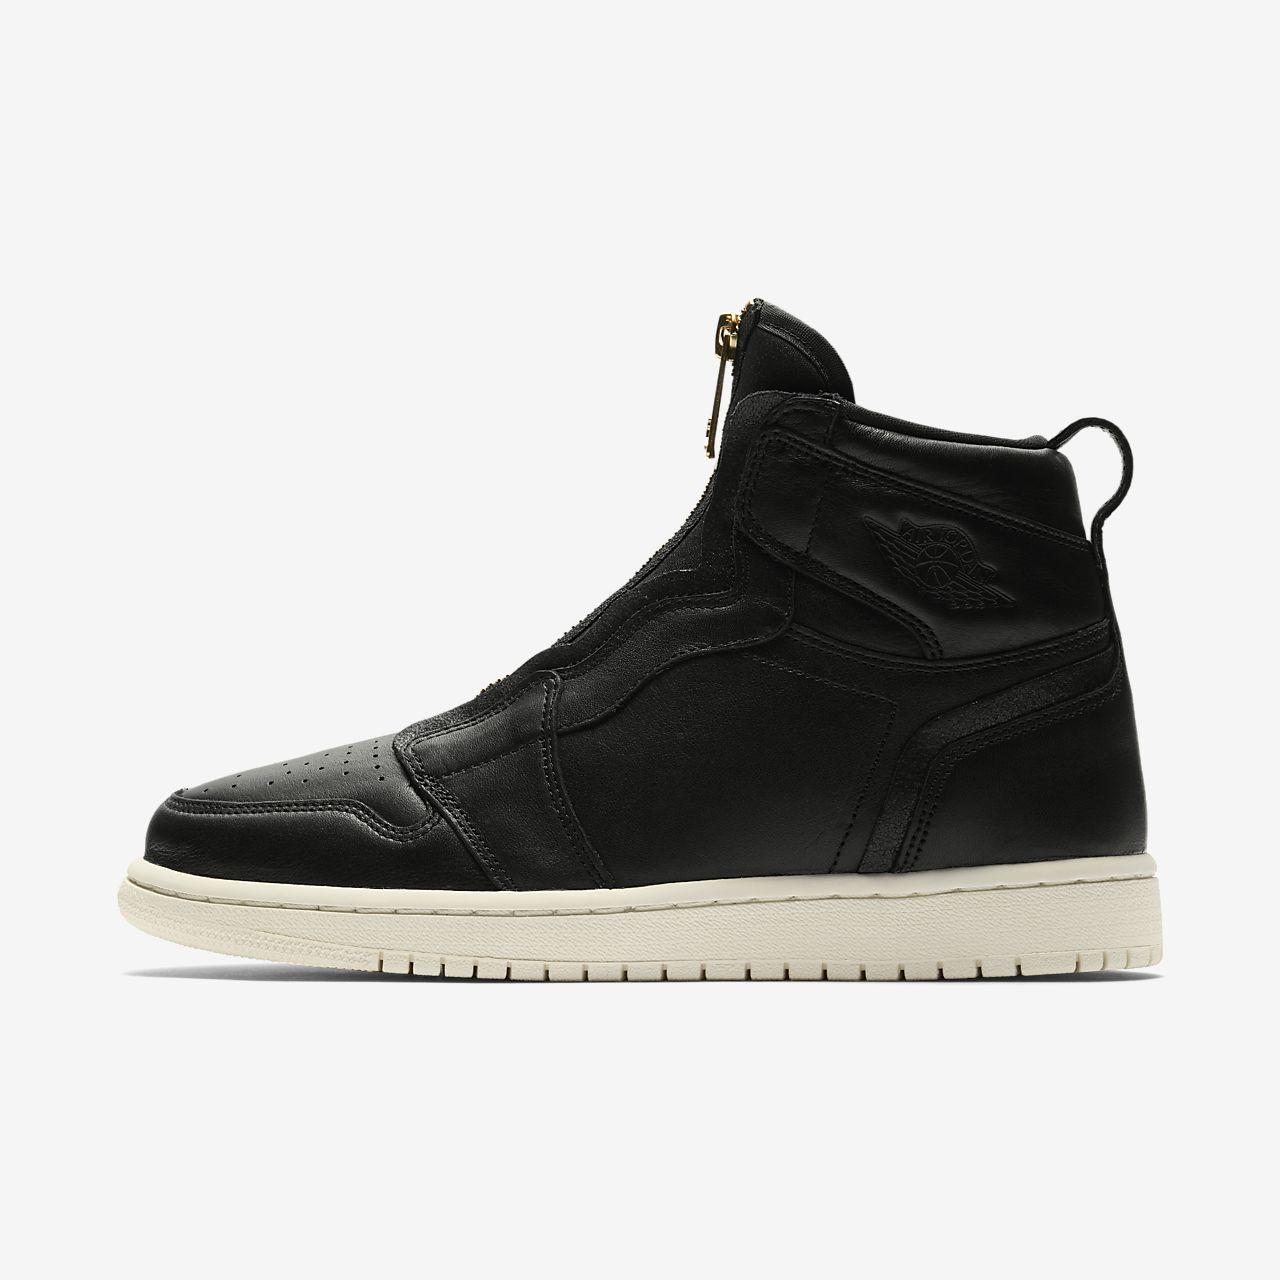 c9835cc2929 Air Jordan 1 High Zip Damesschoen. Nike.com NL